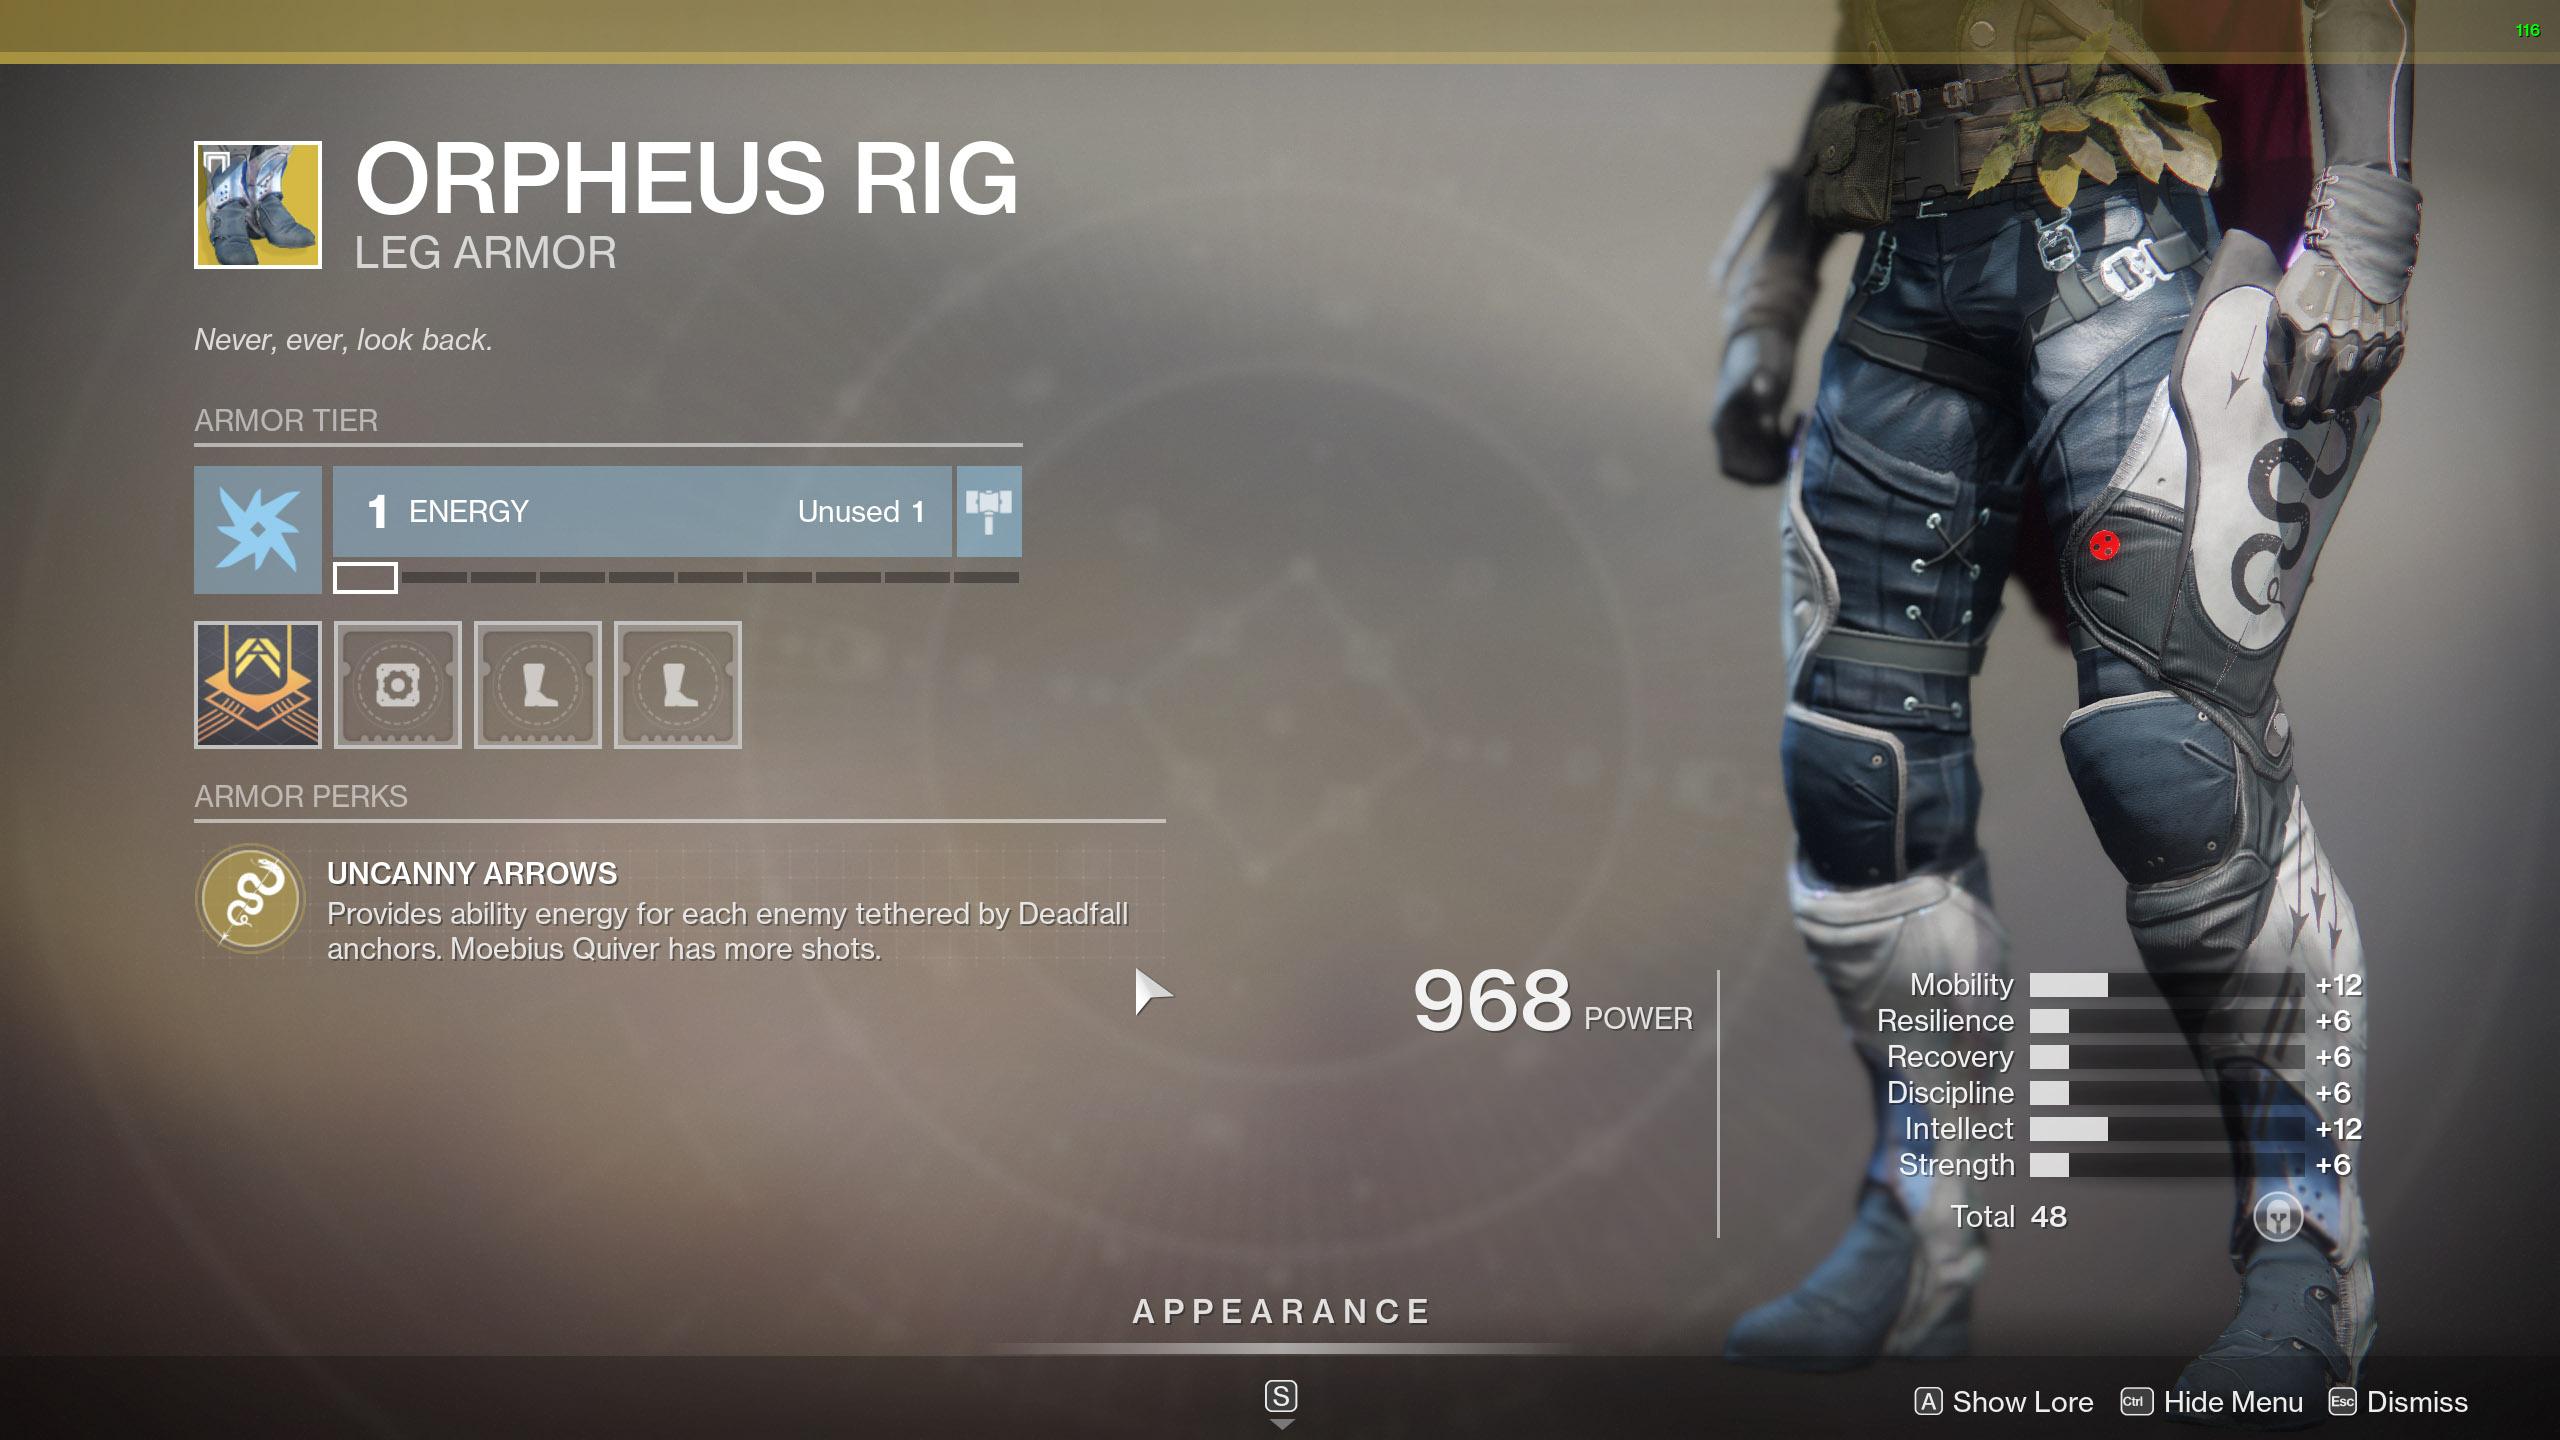 Destiny 2 Exotic Hunter armor Orpheus Rig